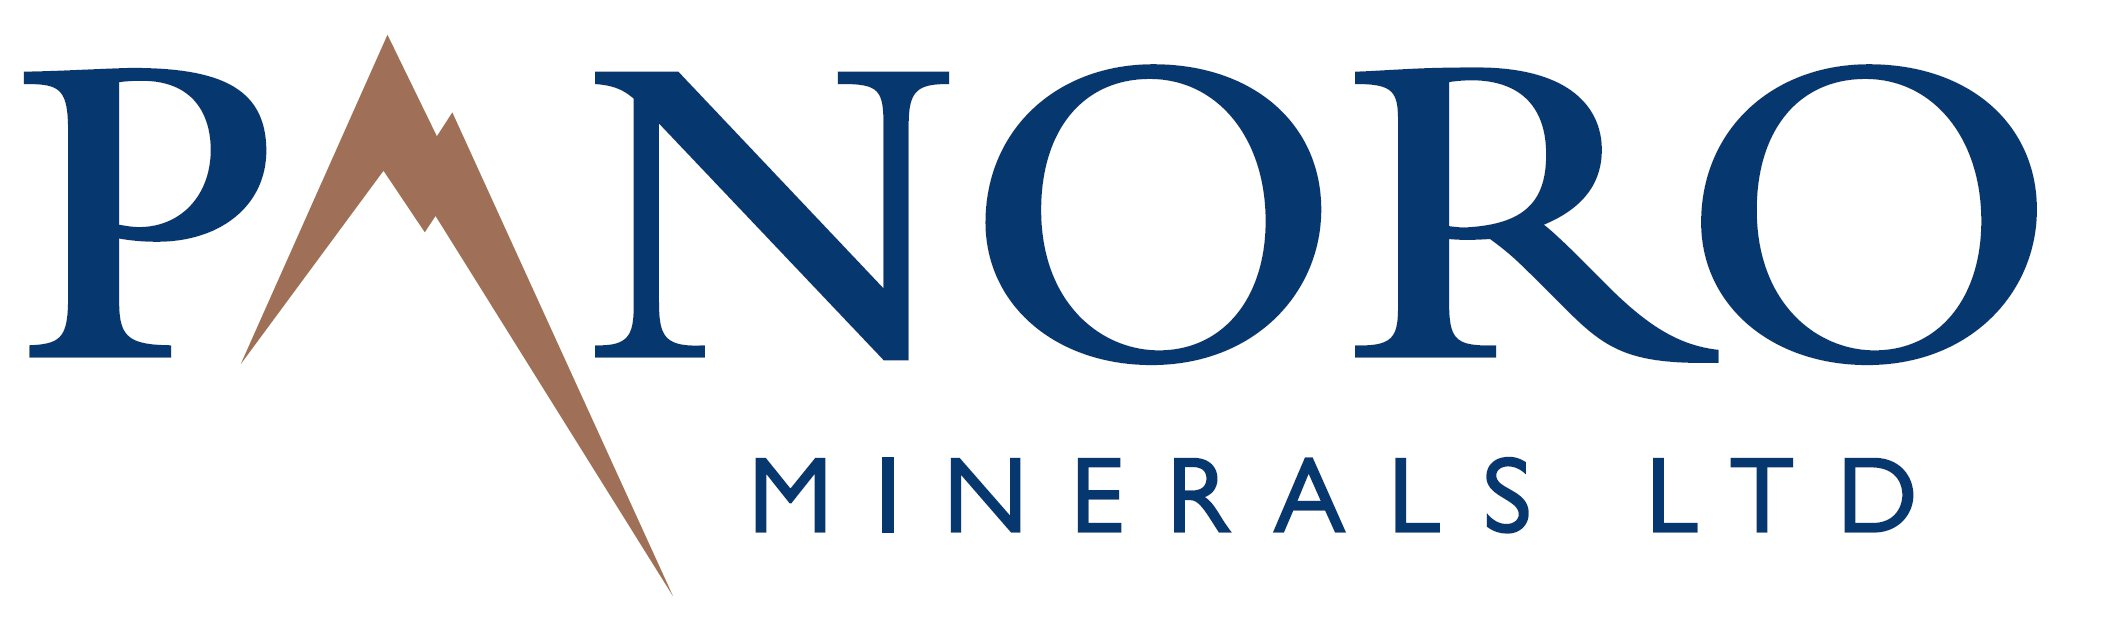 Panoro Minerals Continues Delineating New Mineralization at Humamantata Project, Peru